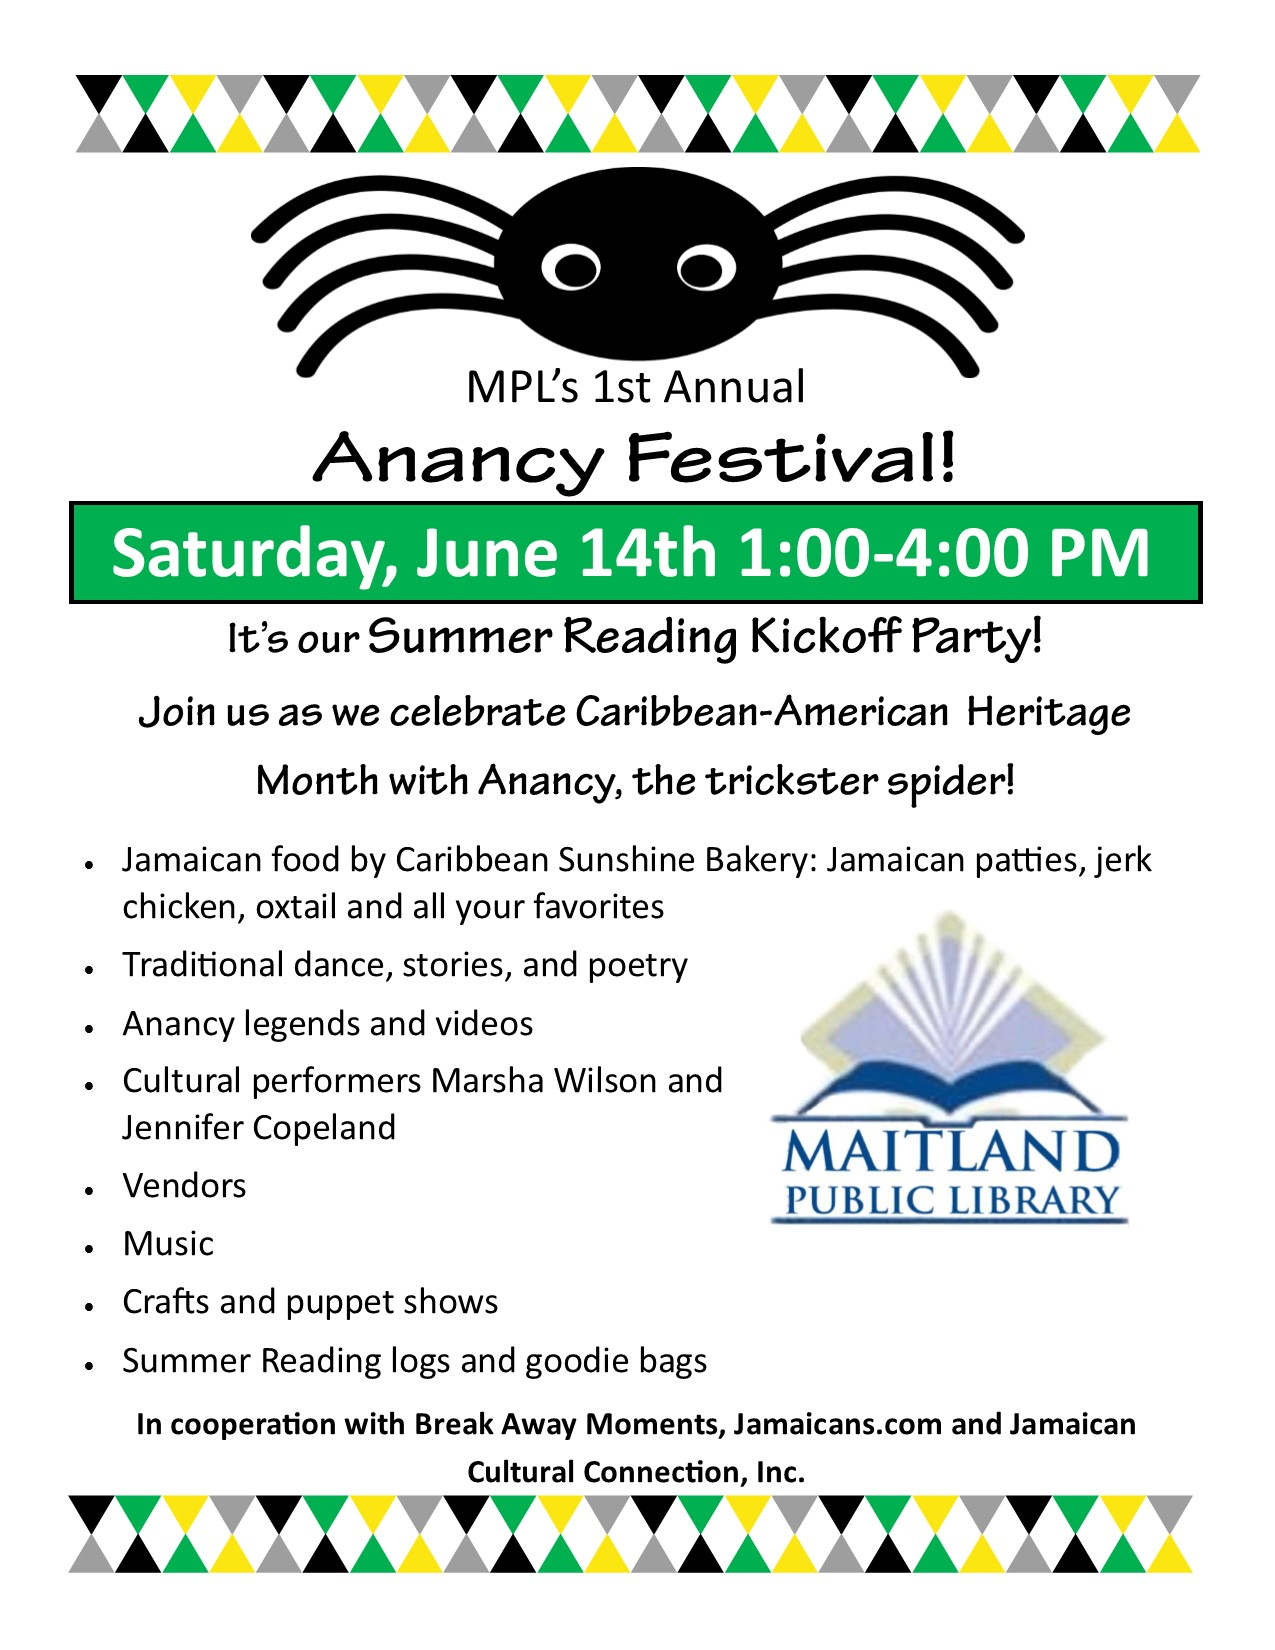 anancy festival orlando